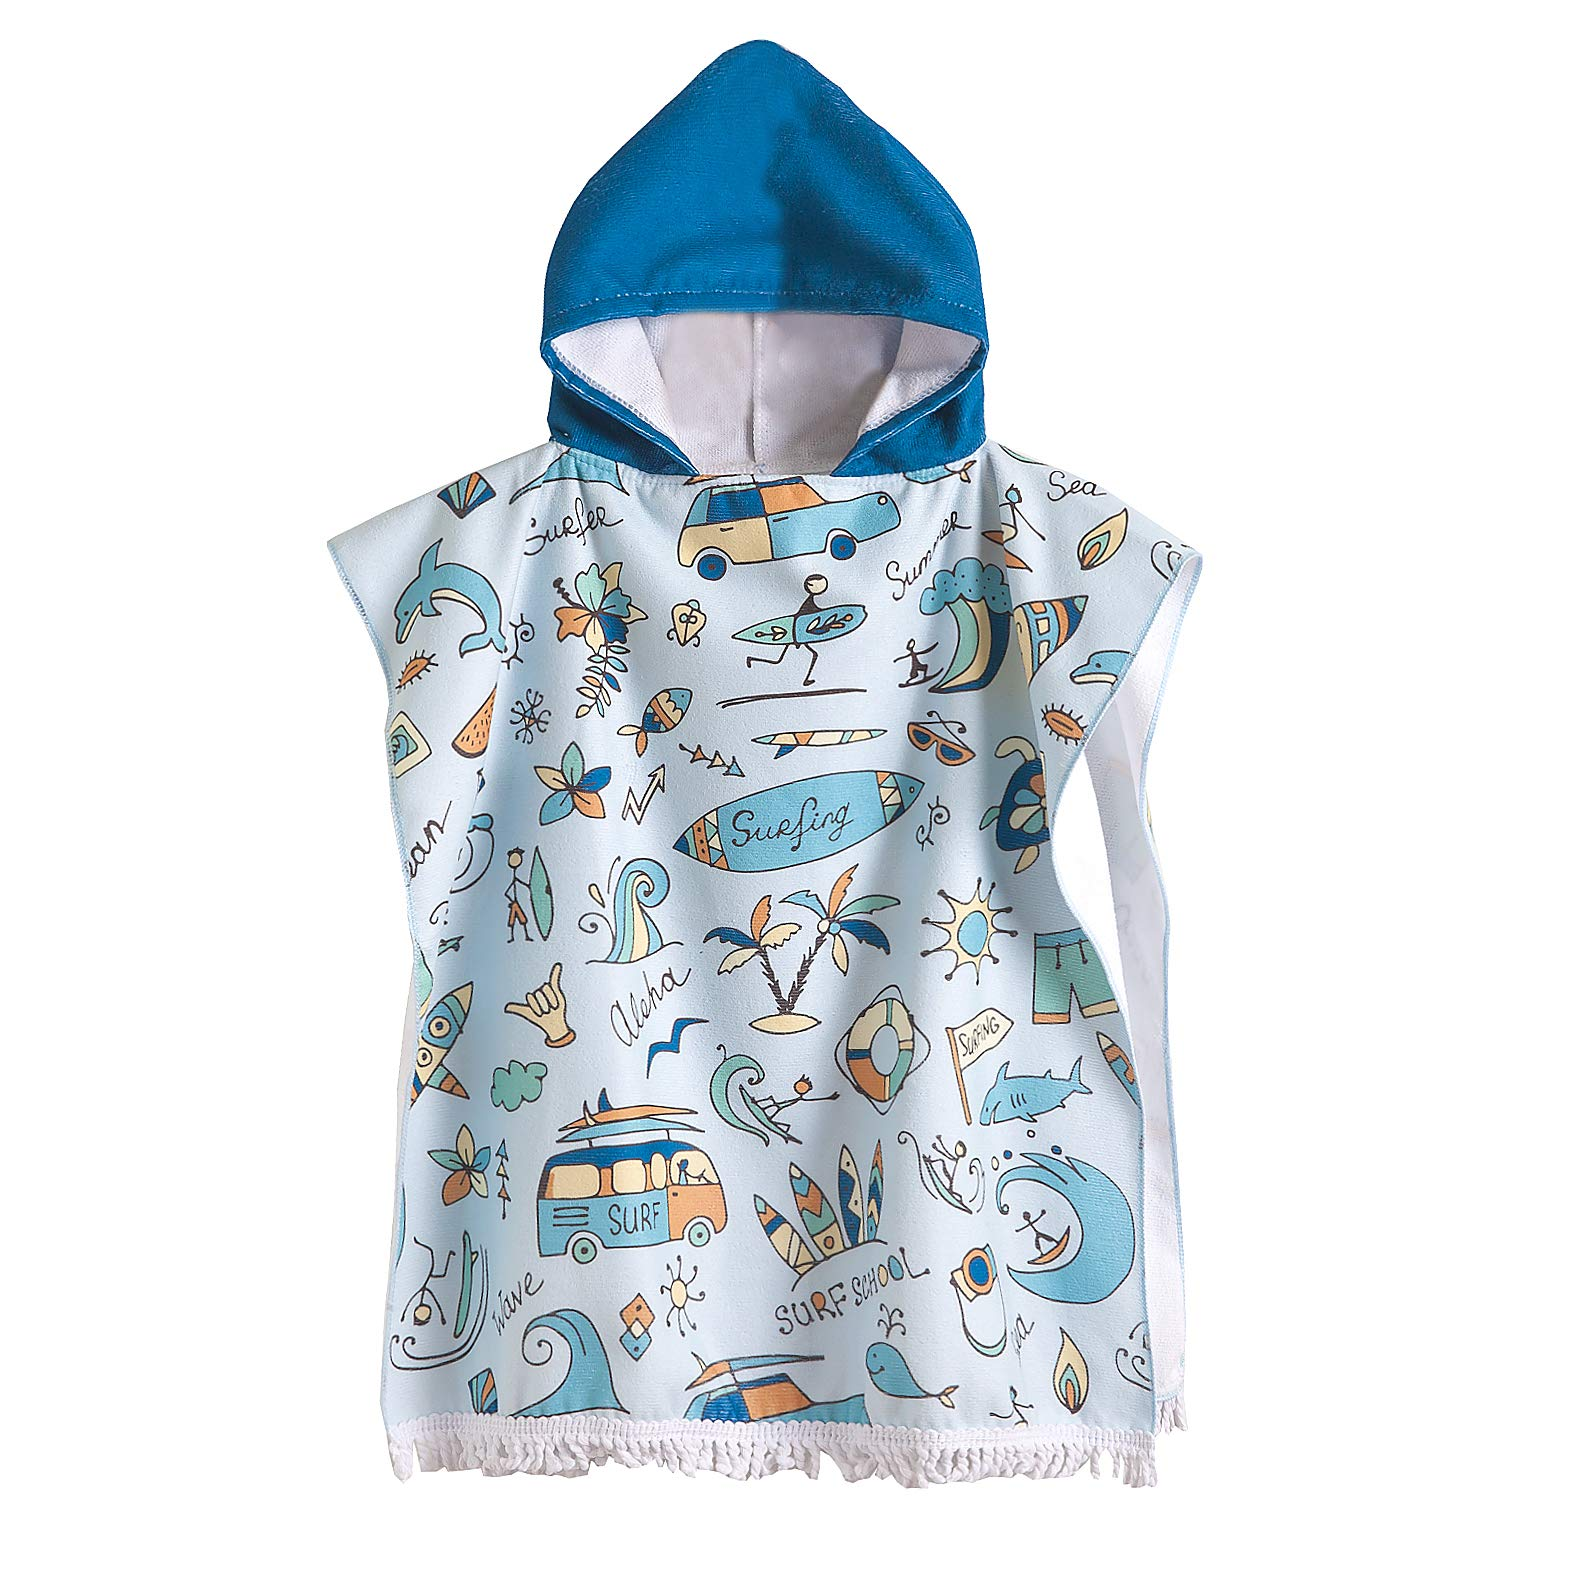 CADITEX Toddler Hooded Beach Bath Towel - Kids Hooded Bath/Beach Towel Girls Boys Cute Cartoon Animal Full Vitality (SURF School)